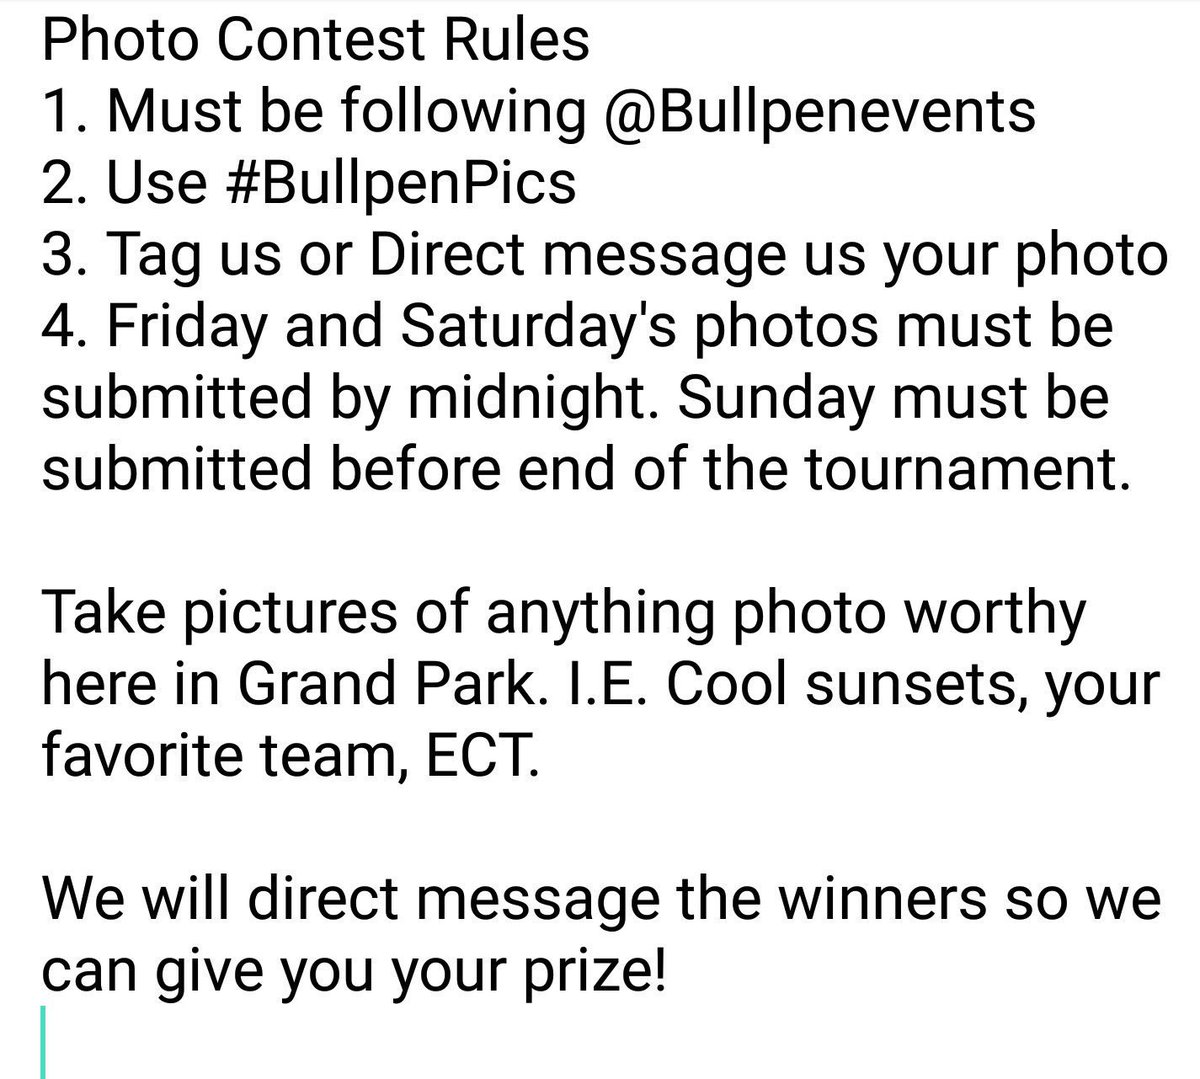 Bullpenevents photo